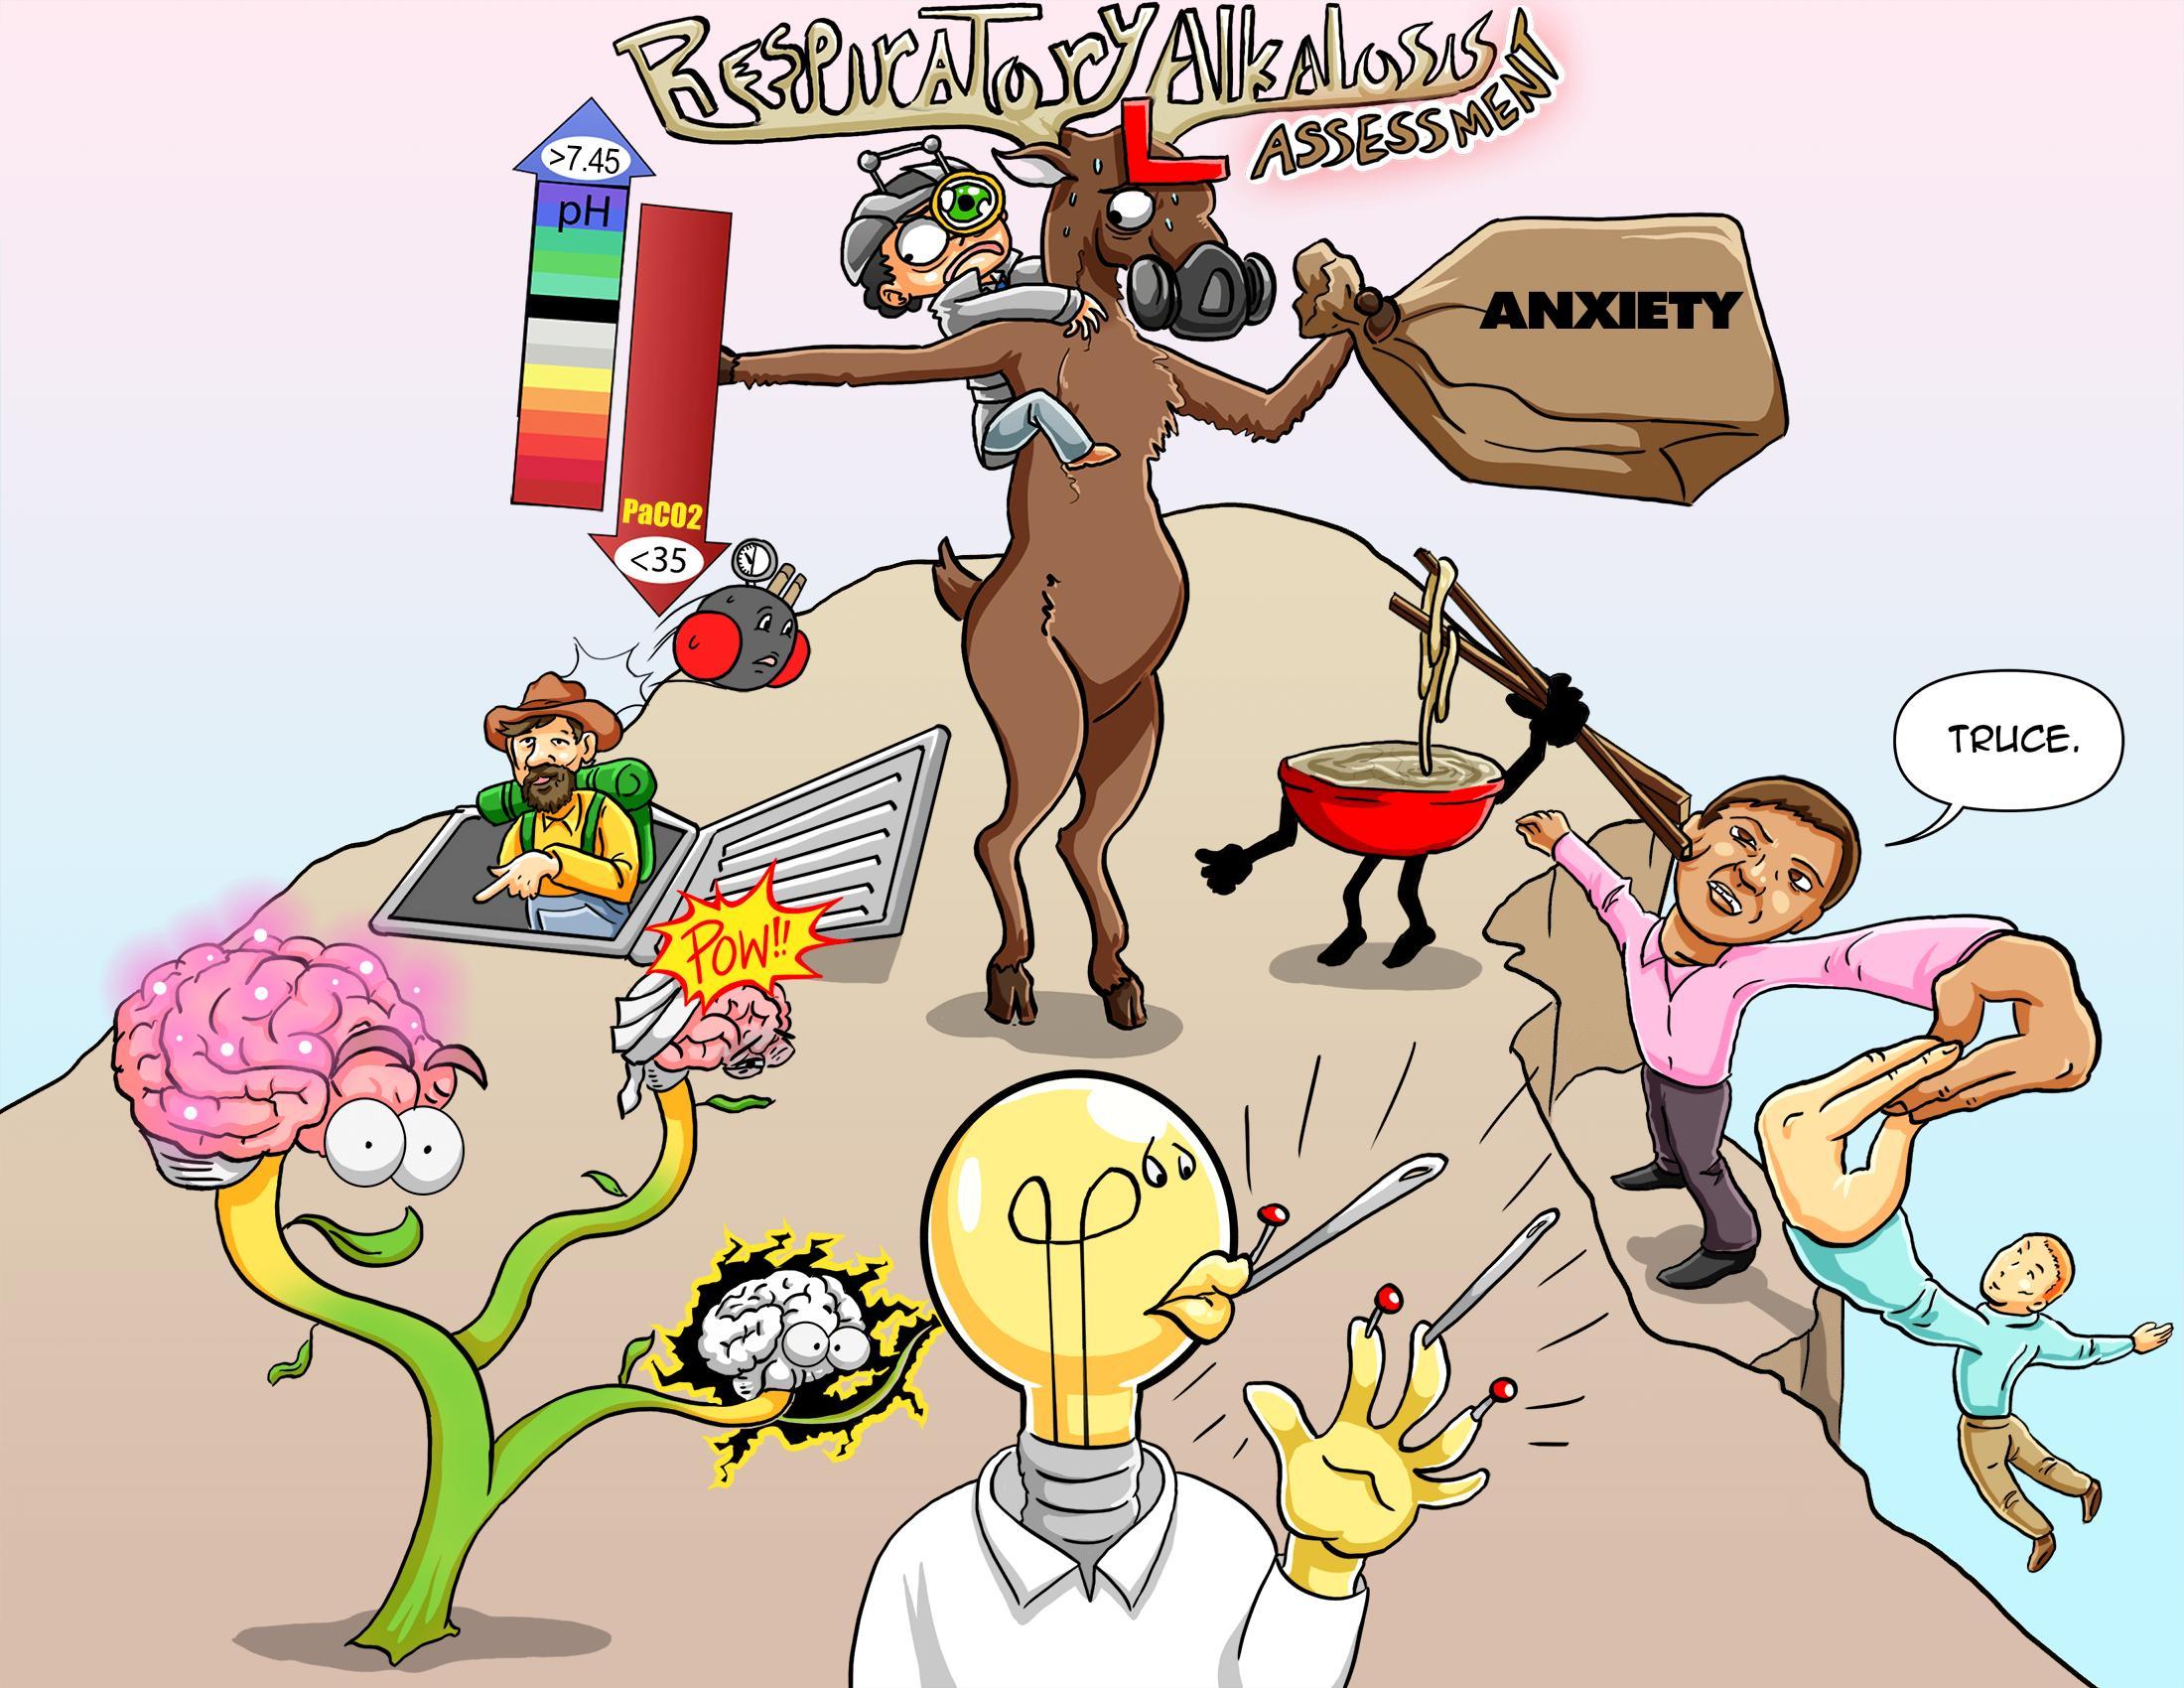 Respiratory Alkalosis Assessment